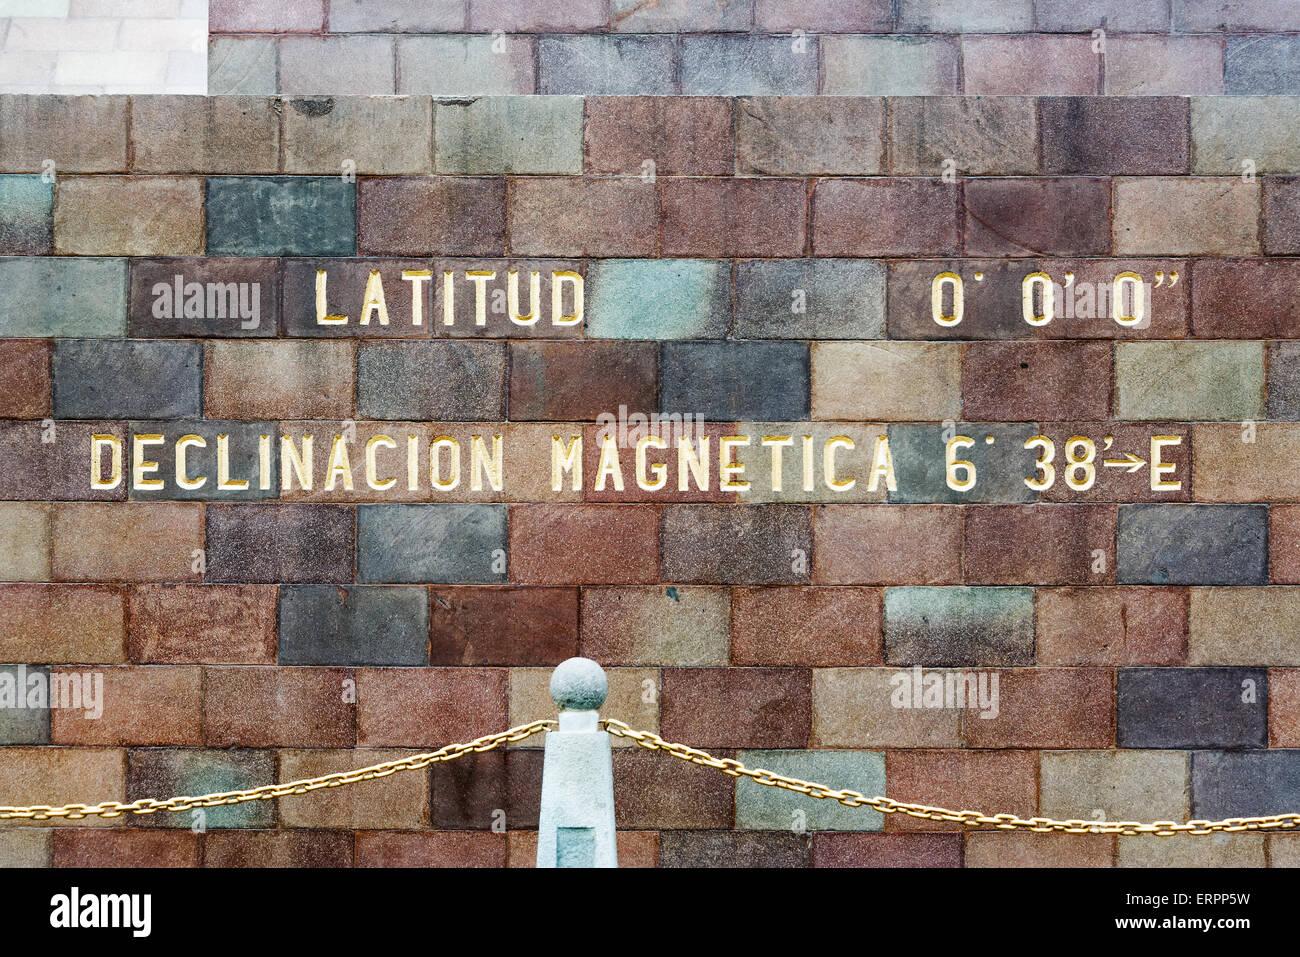 Monument to the equator in Quito, Ecuador displaying 0 degrees latitude - Stock Image